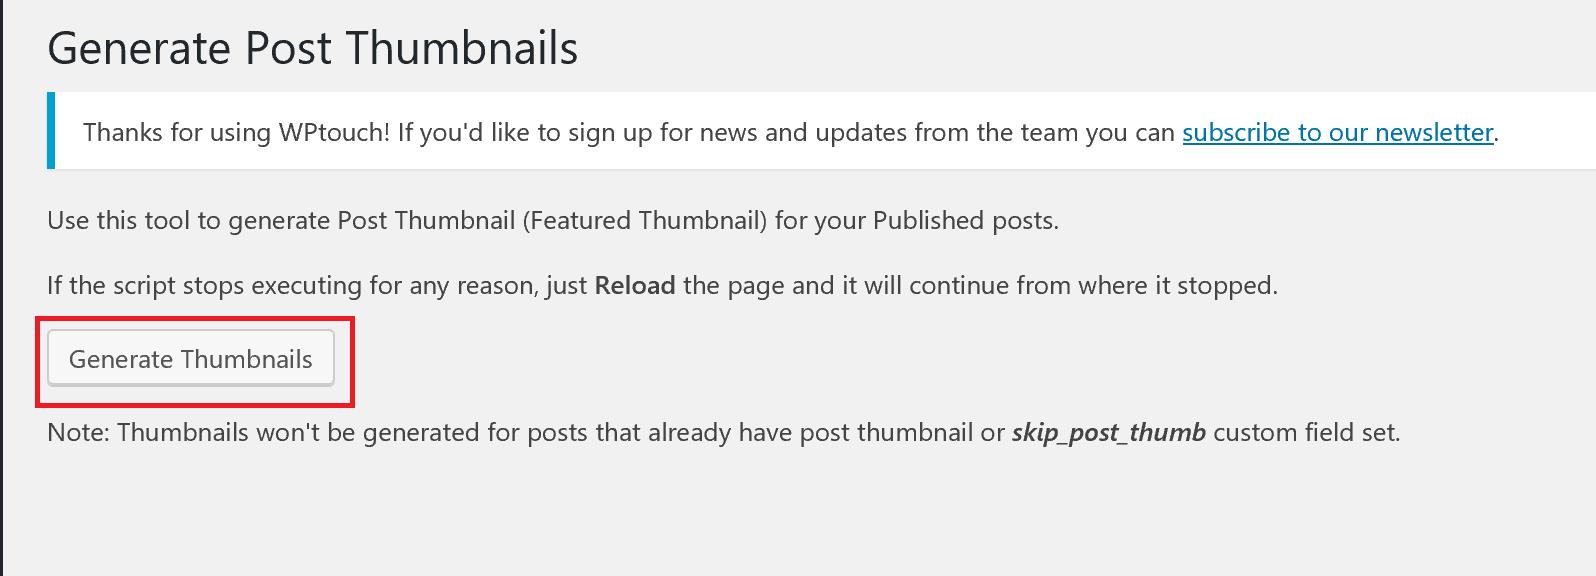 generate post thumbnails - WordPressのアイキャッチ画像を自動設定!プラグインで表示されない時の対処法